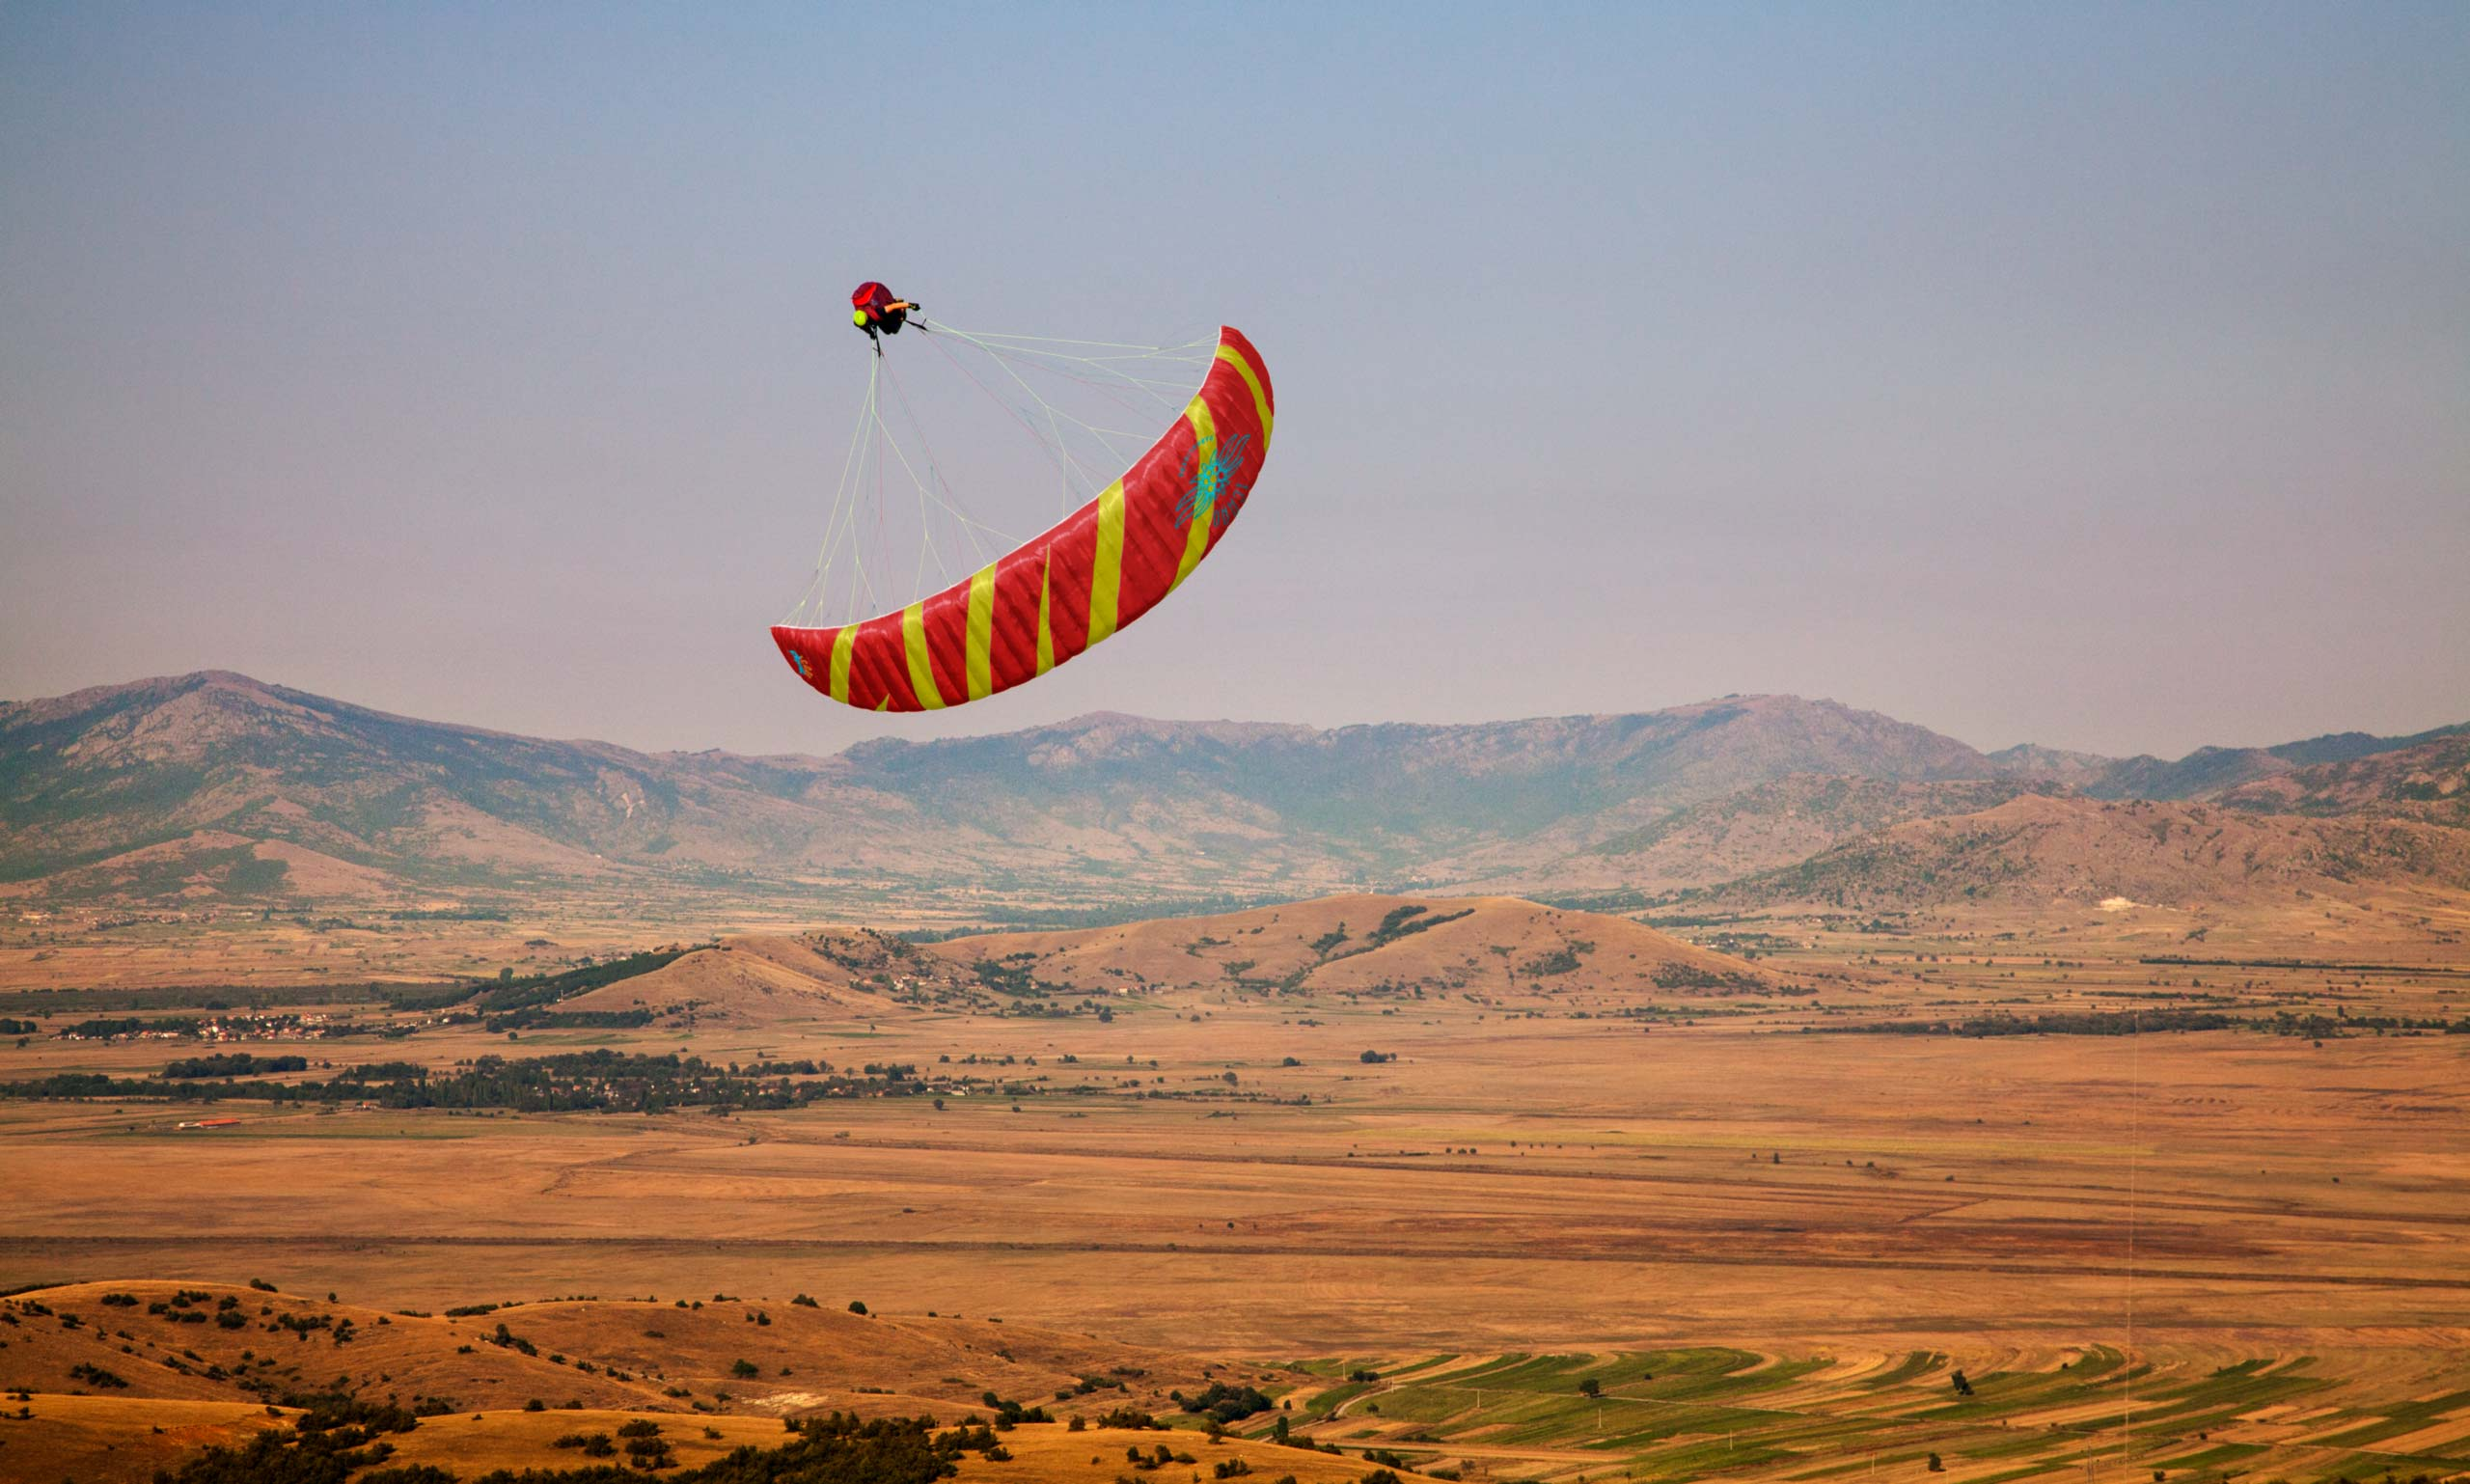 Aquila Icaro Paragliders